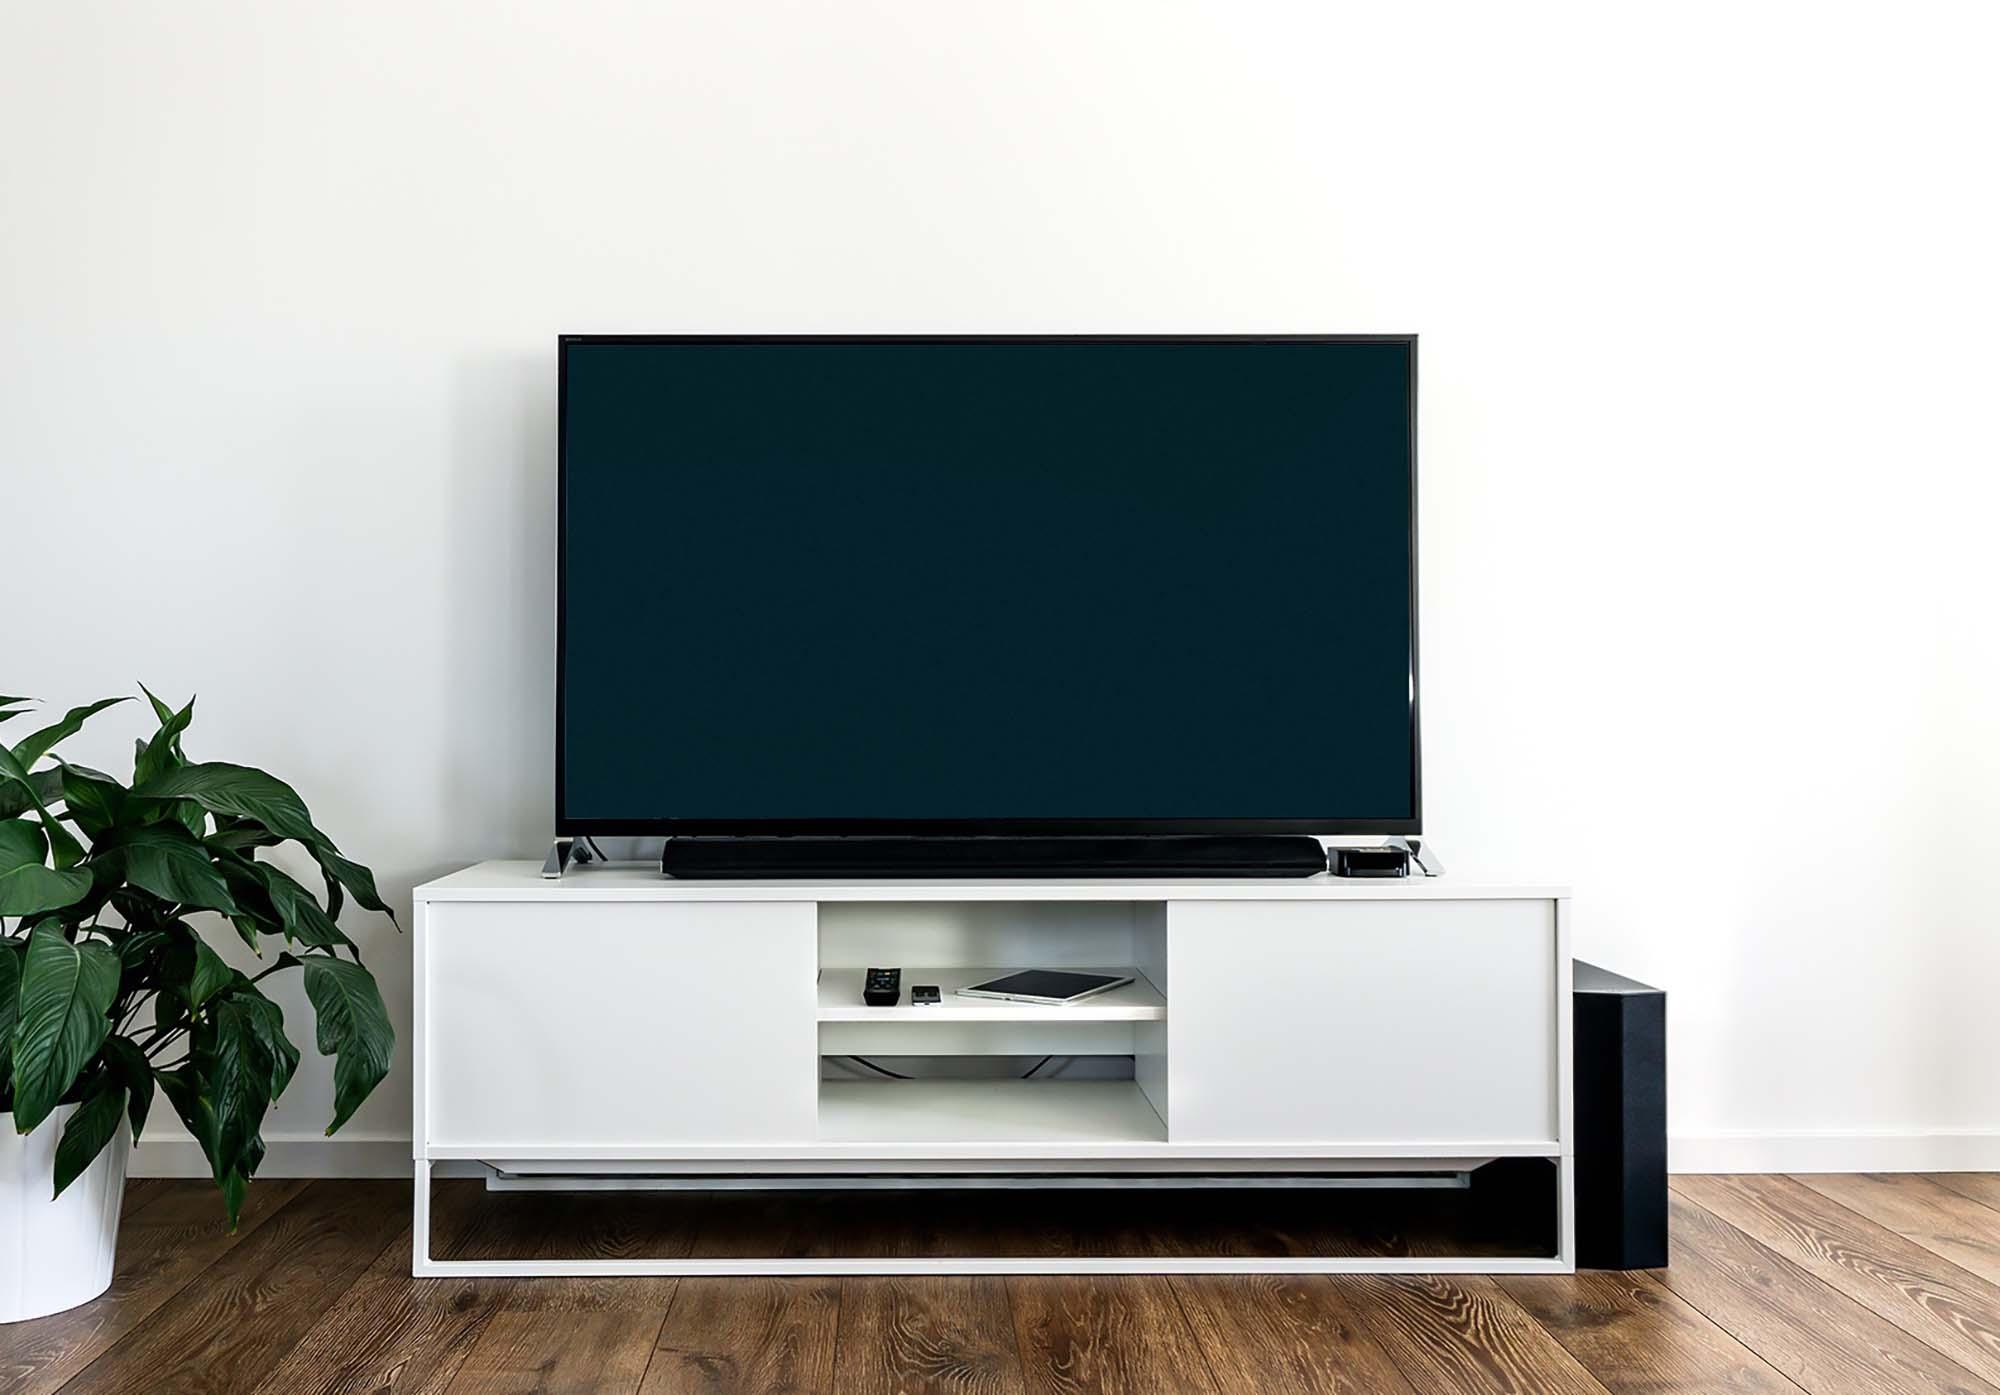 Smart TV Mockup